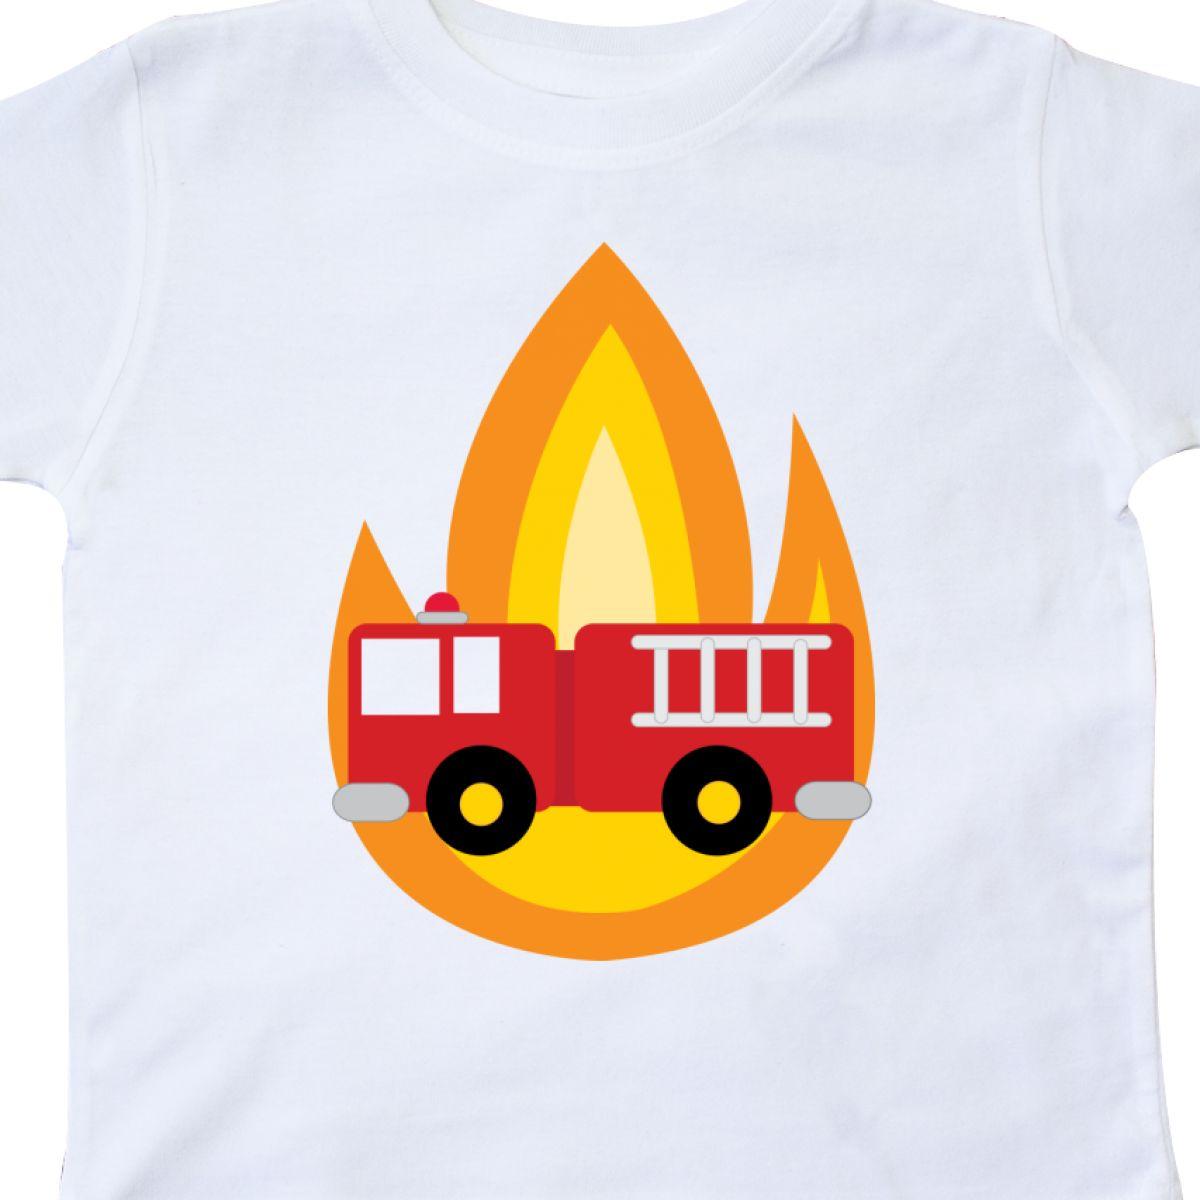 dc915c0f3 Inktastic Fire Truck Firefighter Flames Toddler T-Shirt Engine Kids ...